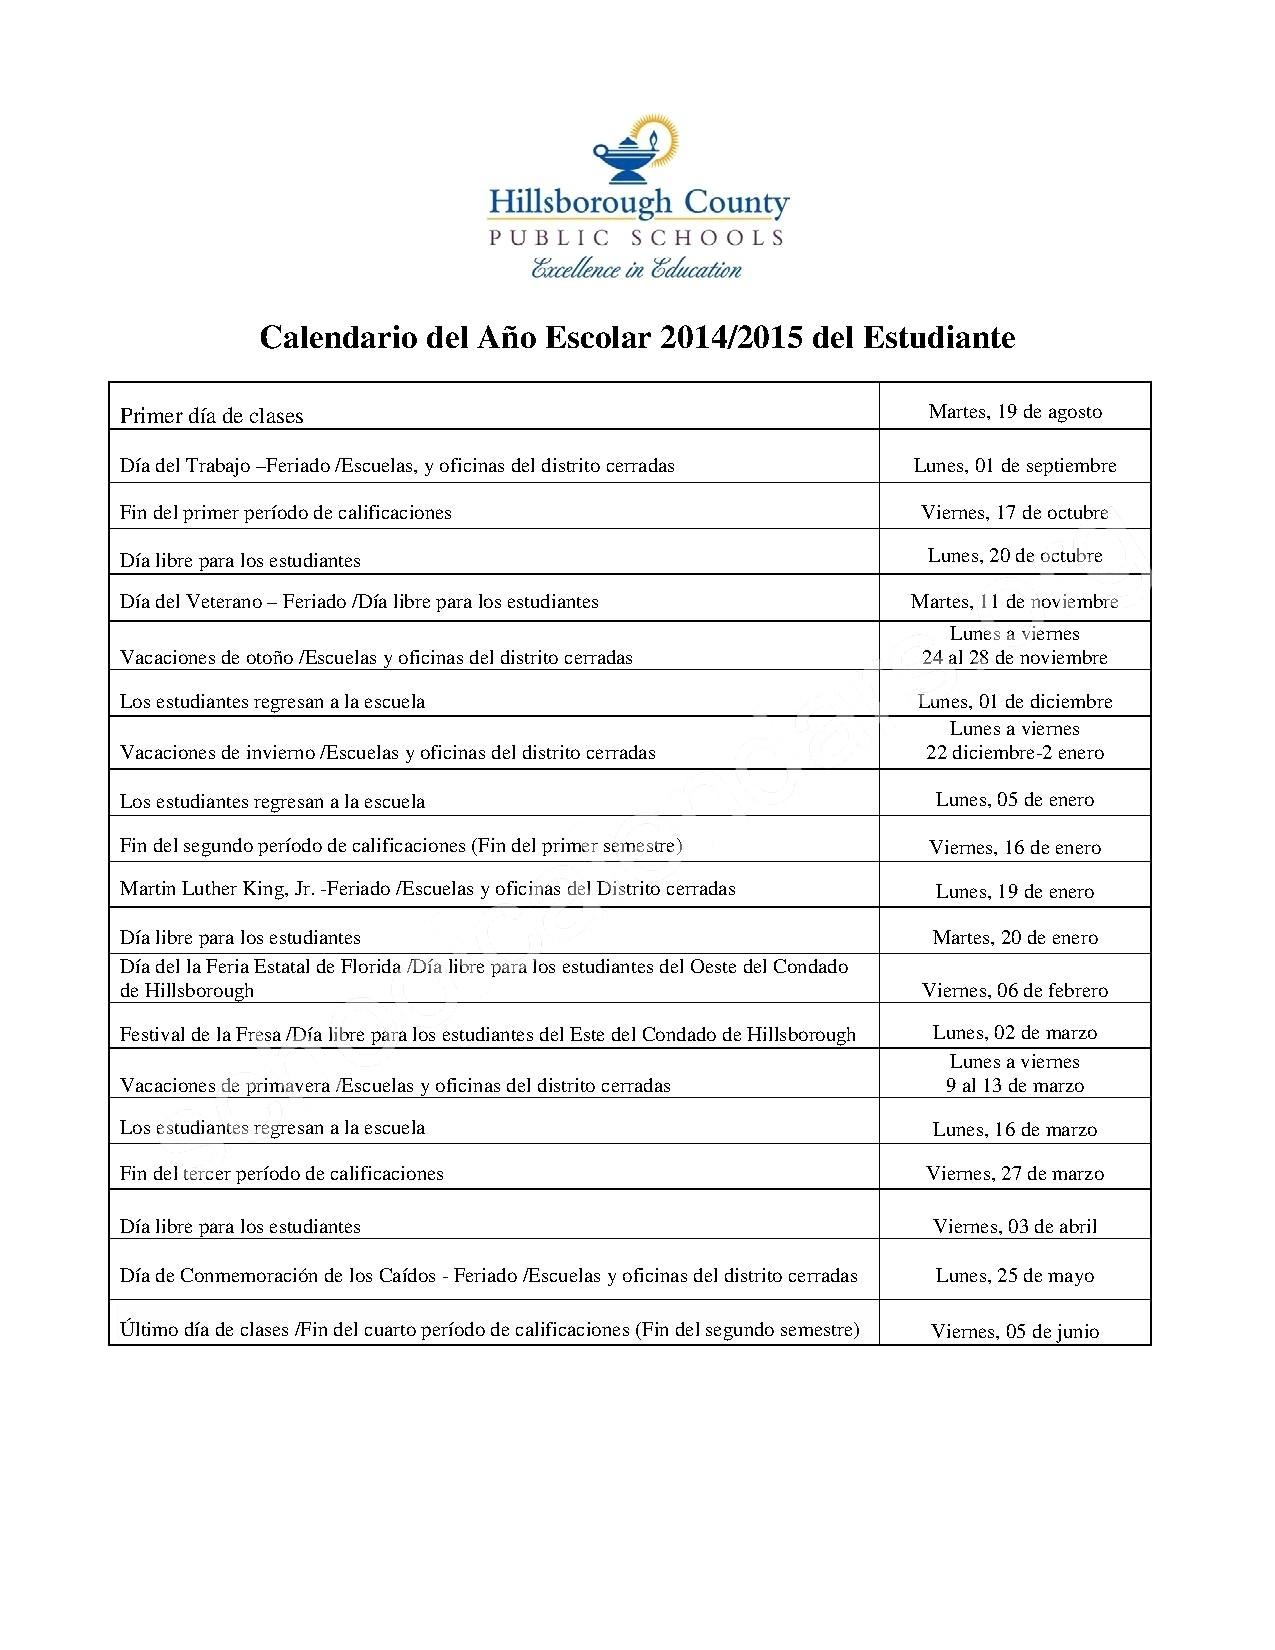 Hillsborough County Schools Calendar | Jcreview_Calendar School Hillsborough County